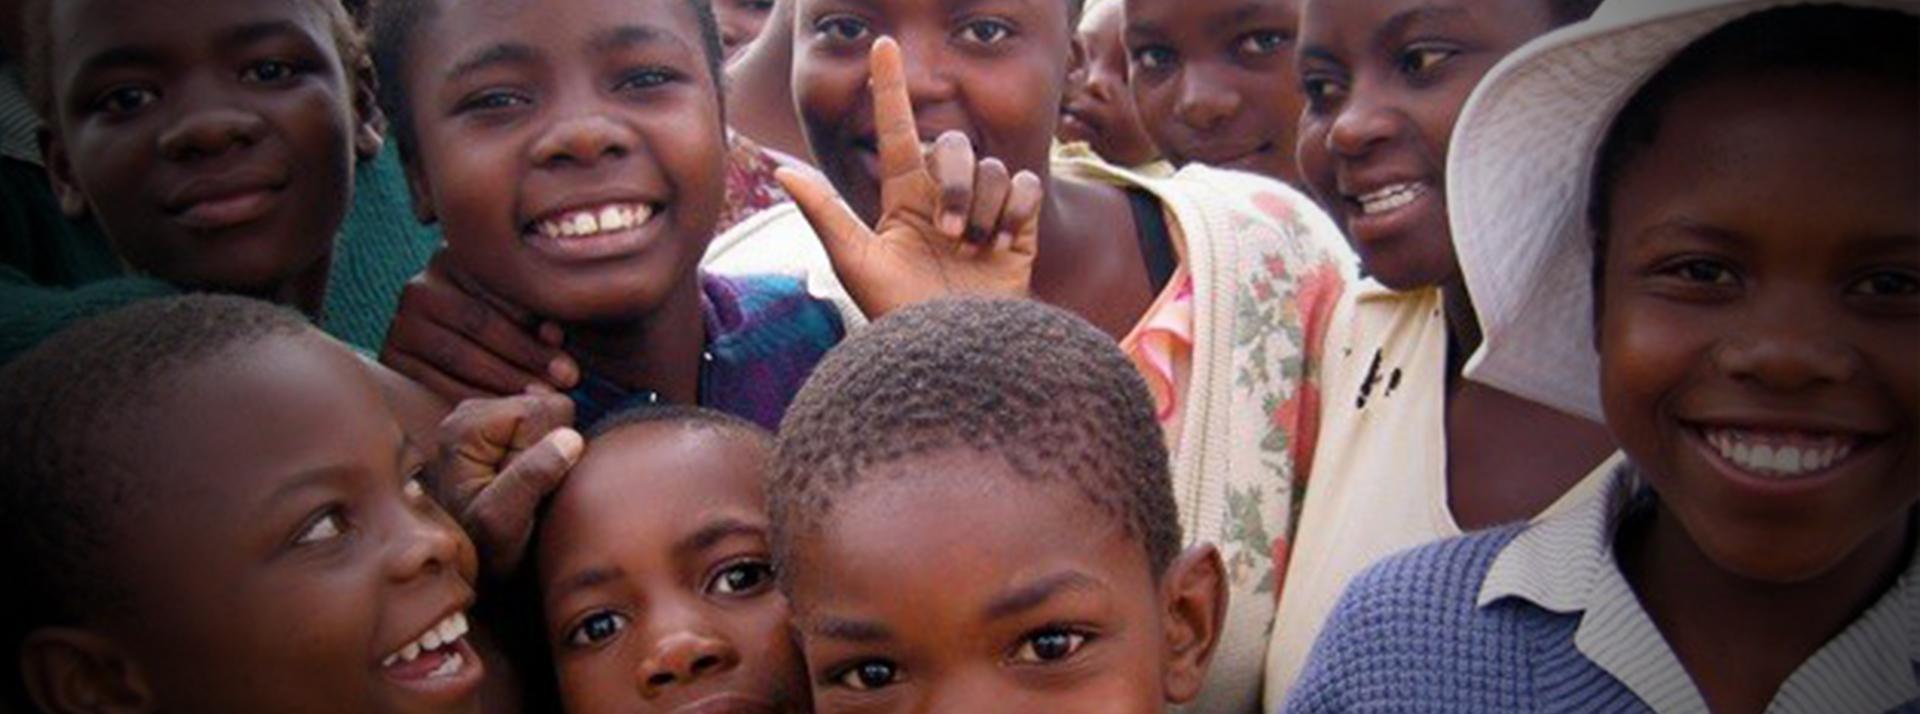 Working to care for the Fatherless in Bulawayo, Zimbabwe